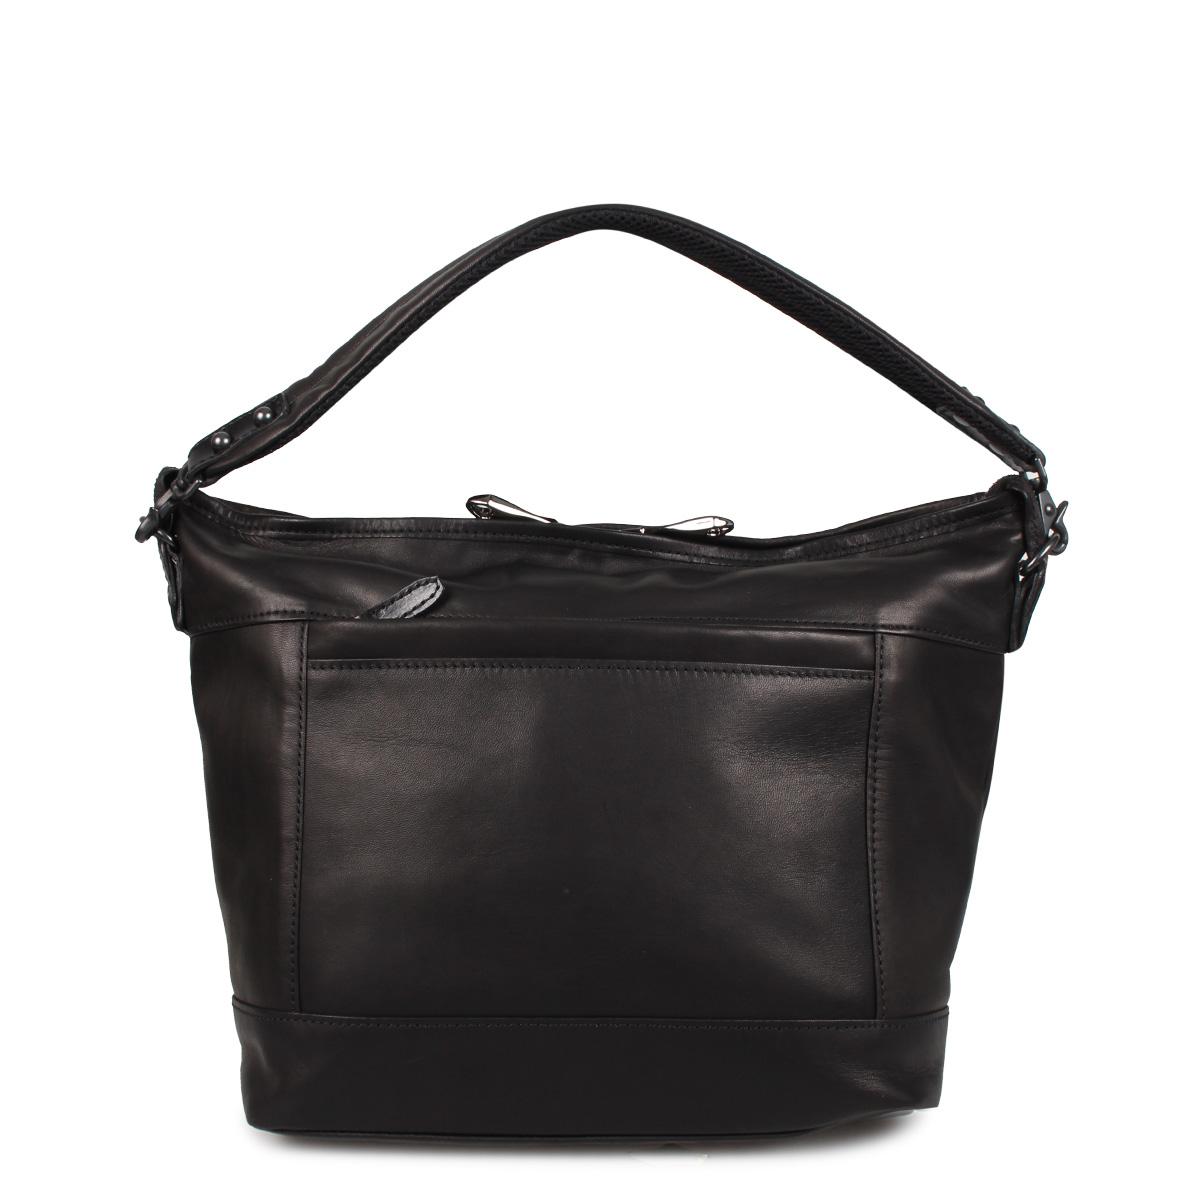 PRAY MINI SHOULDER BAG プレイ バッグ ショルダーバッグ メンズ ブラック 黒 PRSHD-302 [4/6 新入荷]